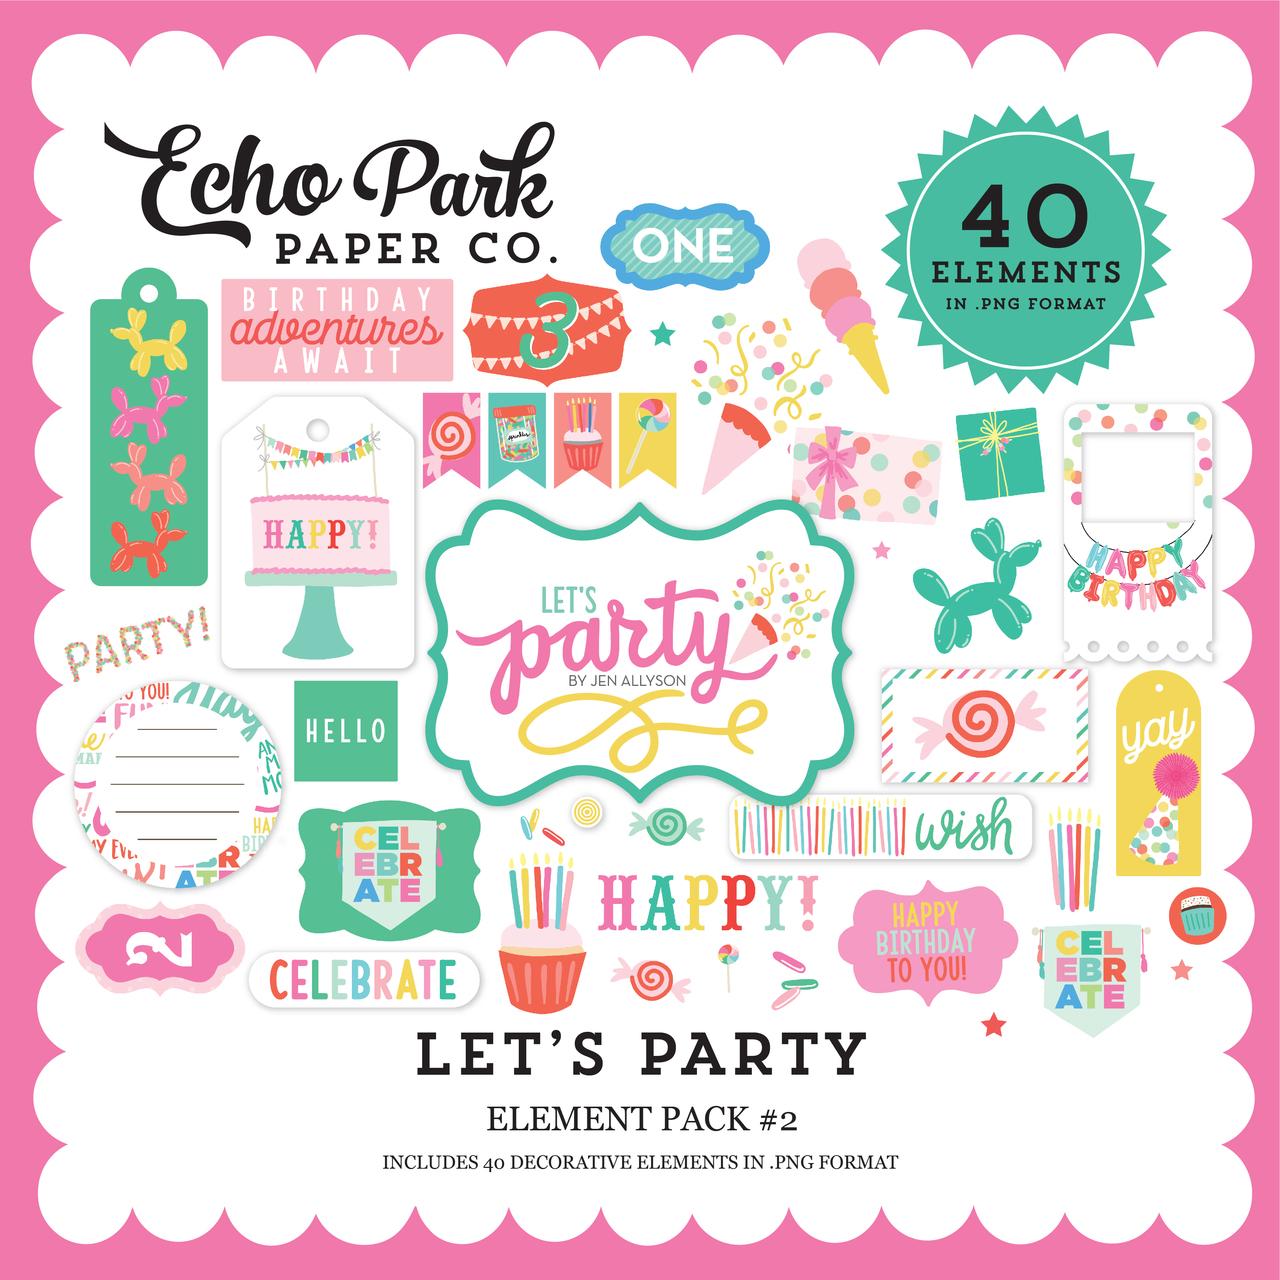 Let's Party Element Pack #2